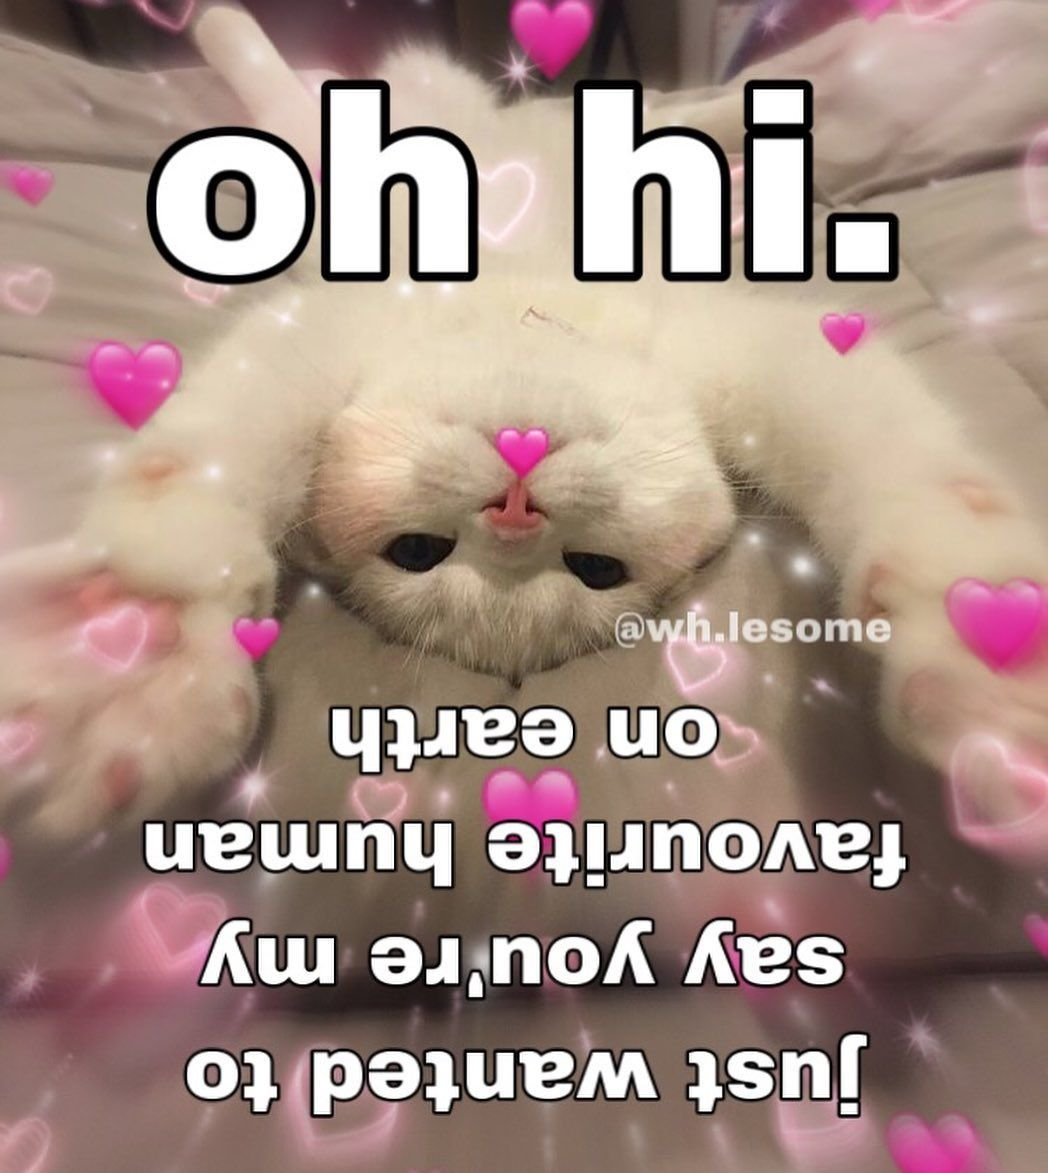 Pin by Novalie on compliment jar Love you meme, Love